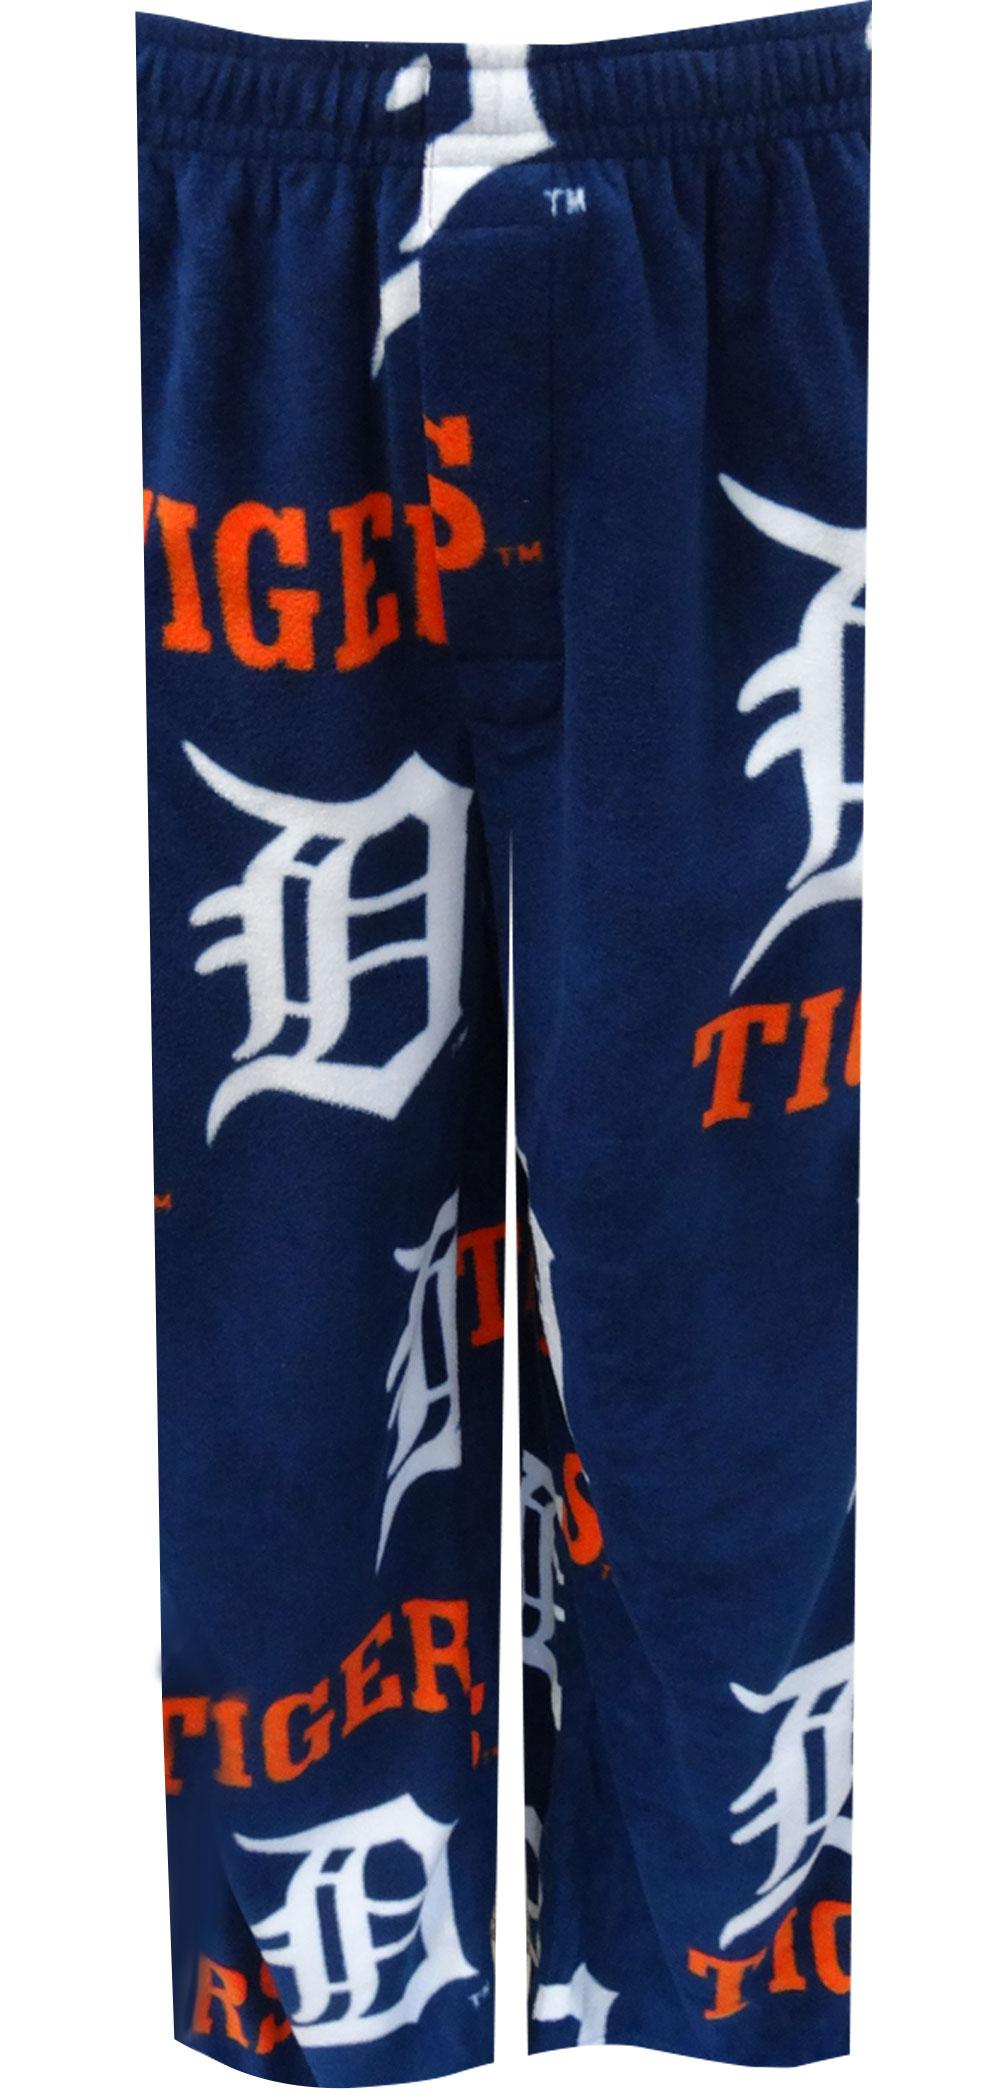 Detroit Tigers Classic Logos Guys Fleece Lounge Pants for men